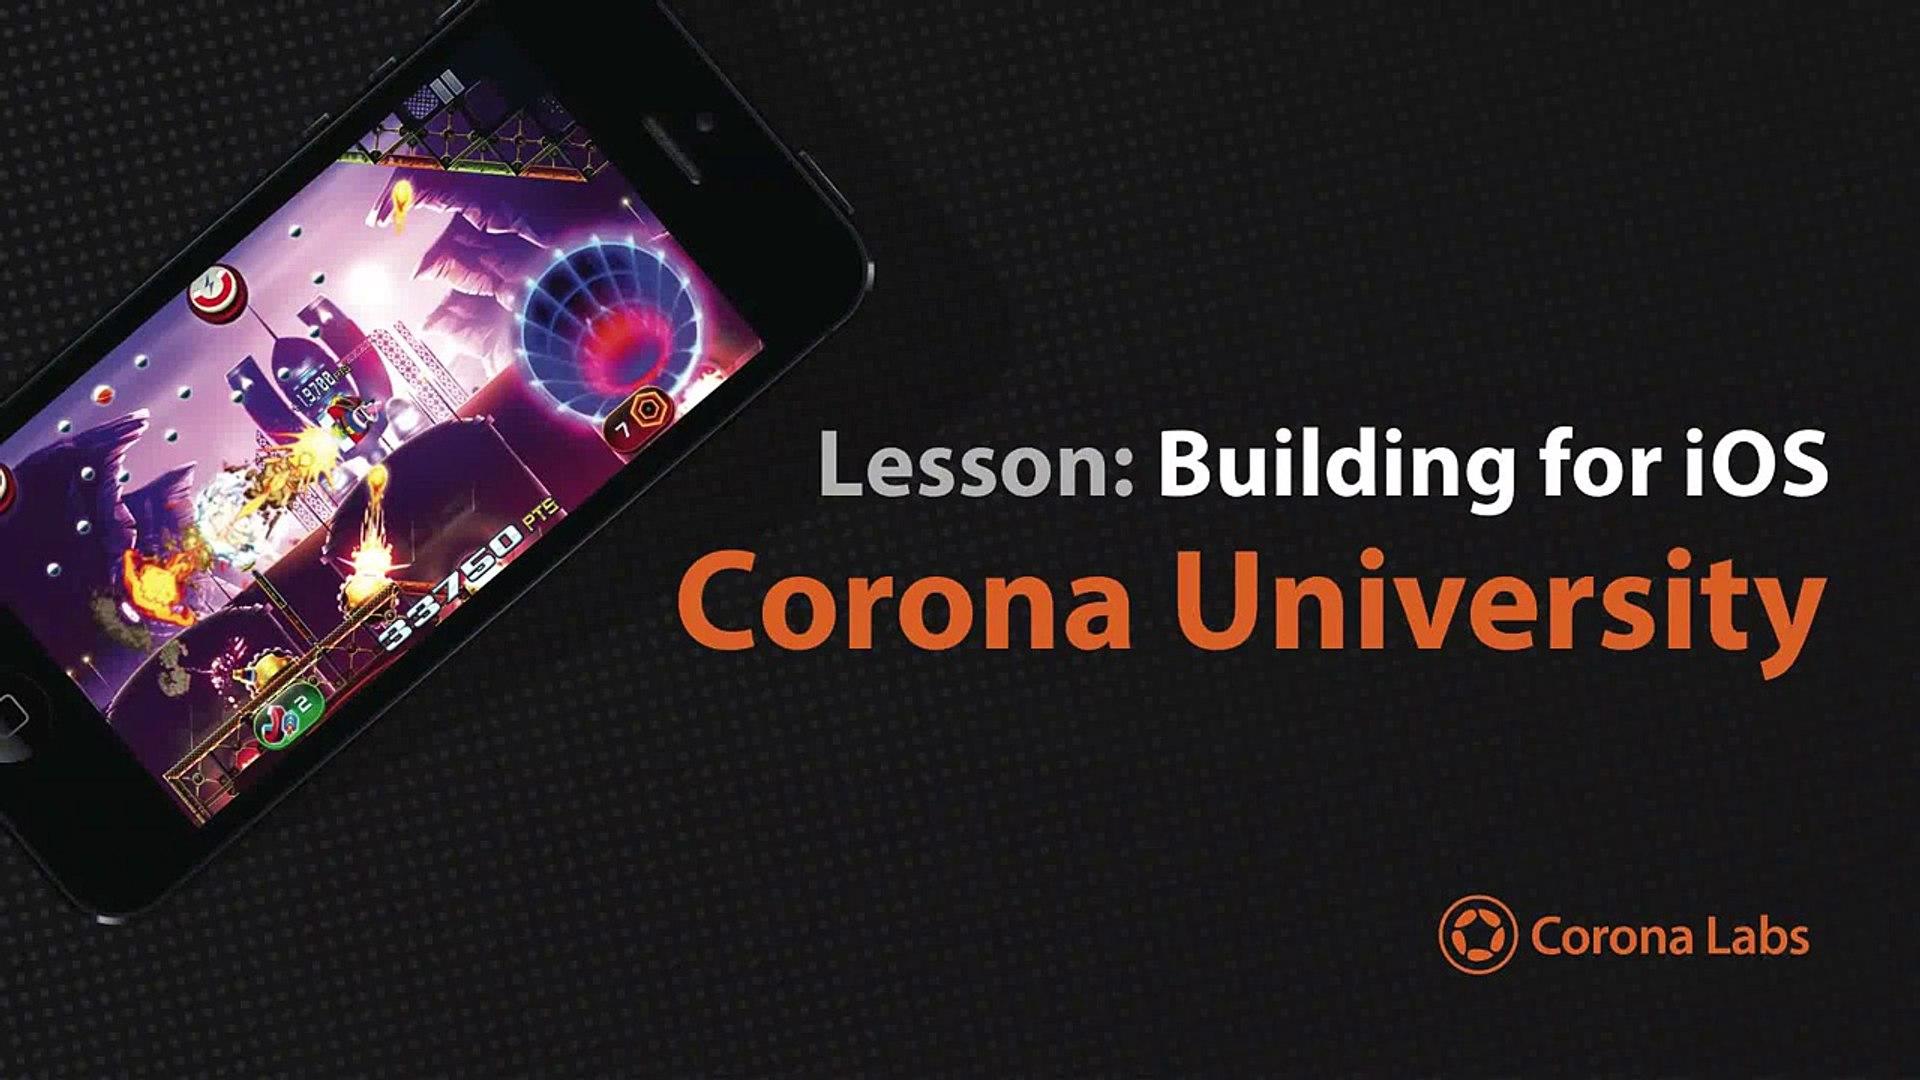 Corona University - Building for iOS using Corona SDK